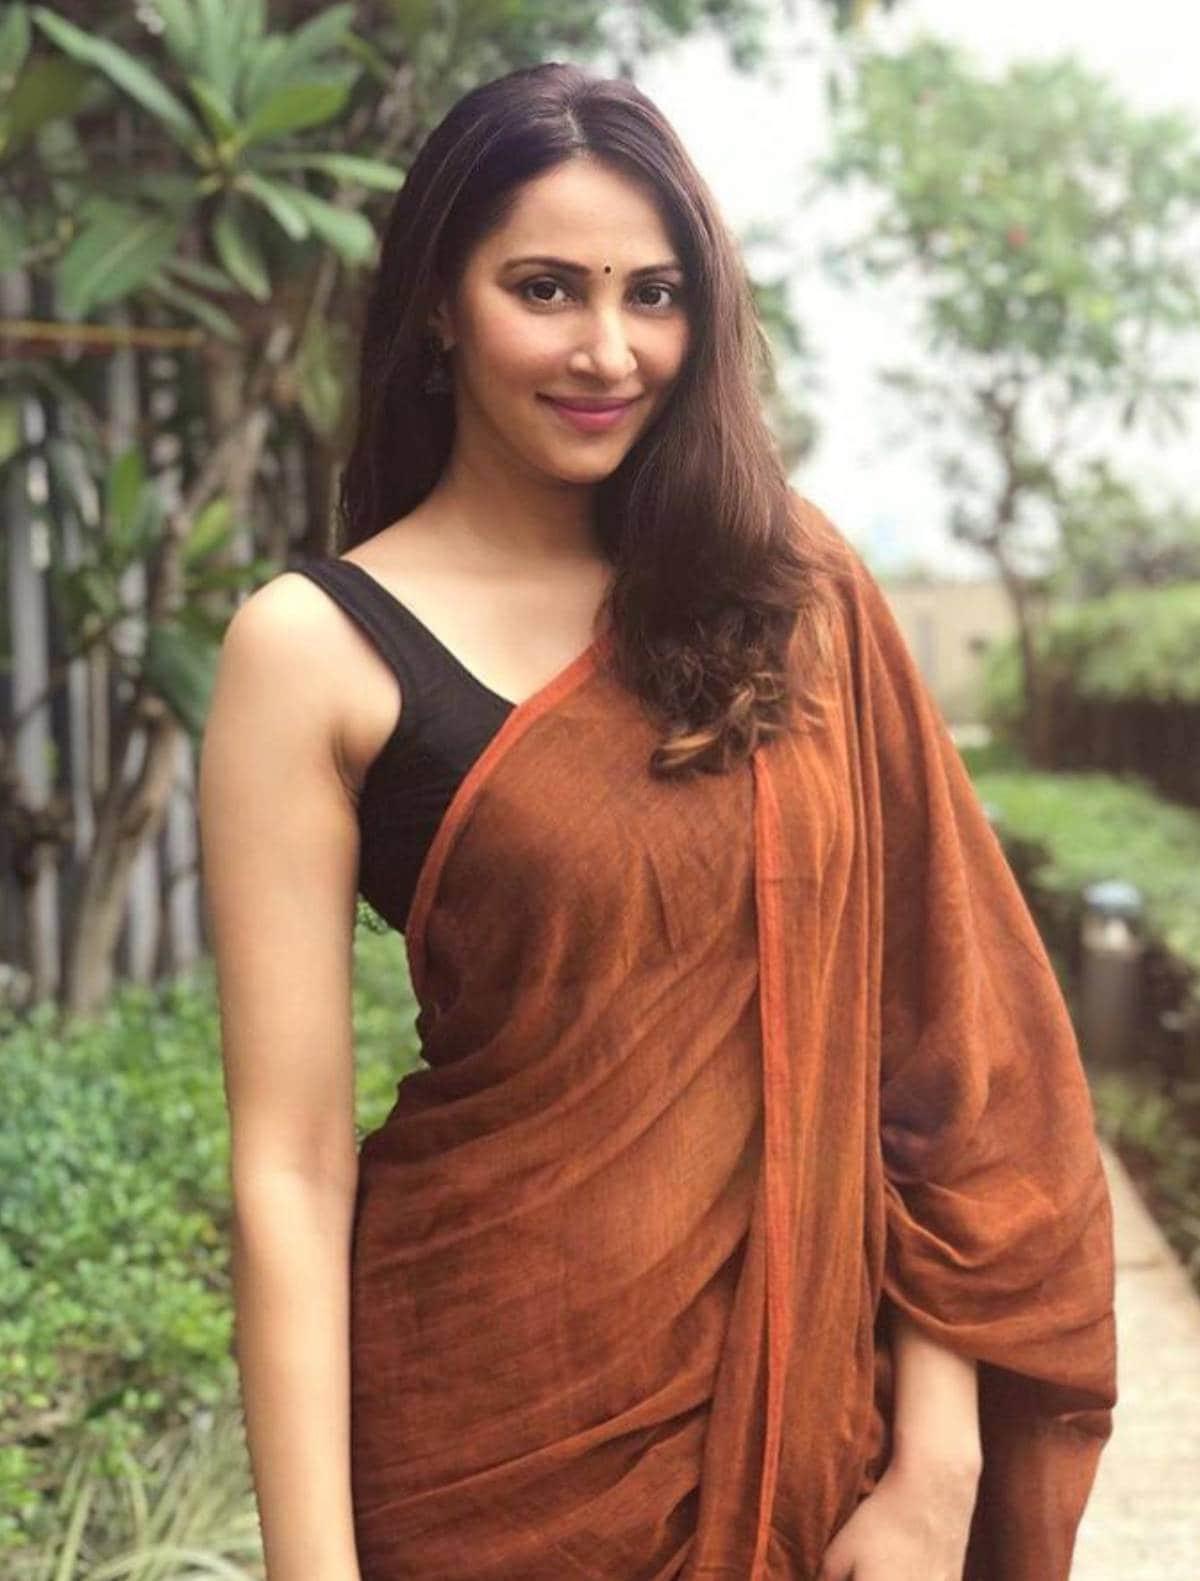 tv actress,rishima kandhari,devi kaalratri,kaalratri avatar,tv news ,ऋषिना कंधारी